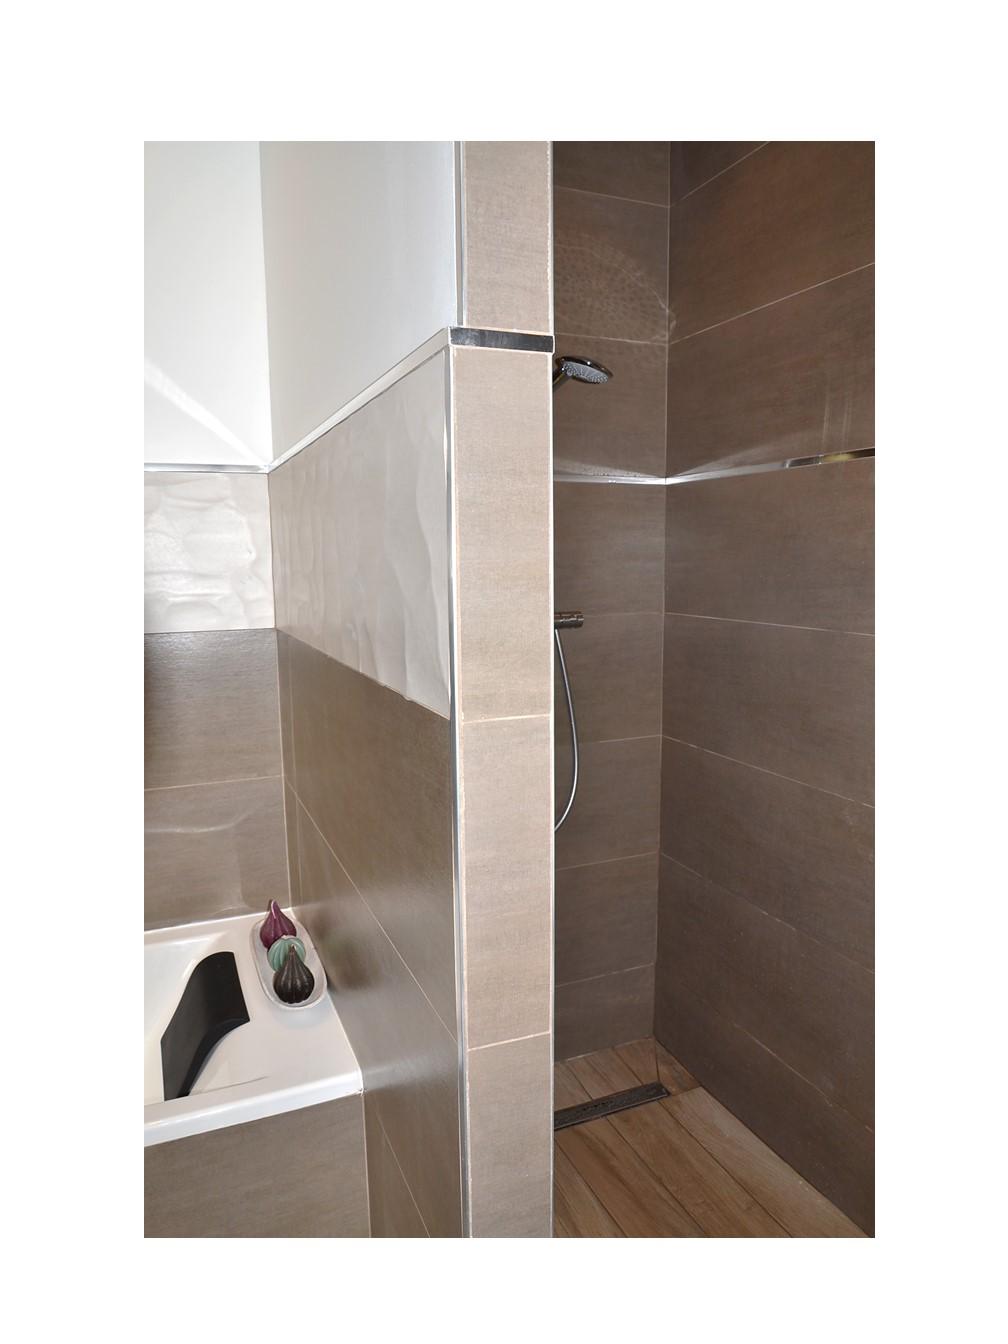 conception cr ation salle de bain reims estelle jubelinestelle jubelin. Black Bedroom Furniture Sets. Home Design Ideas